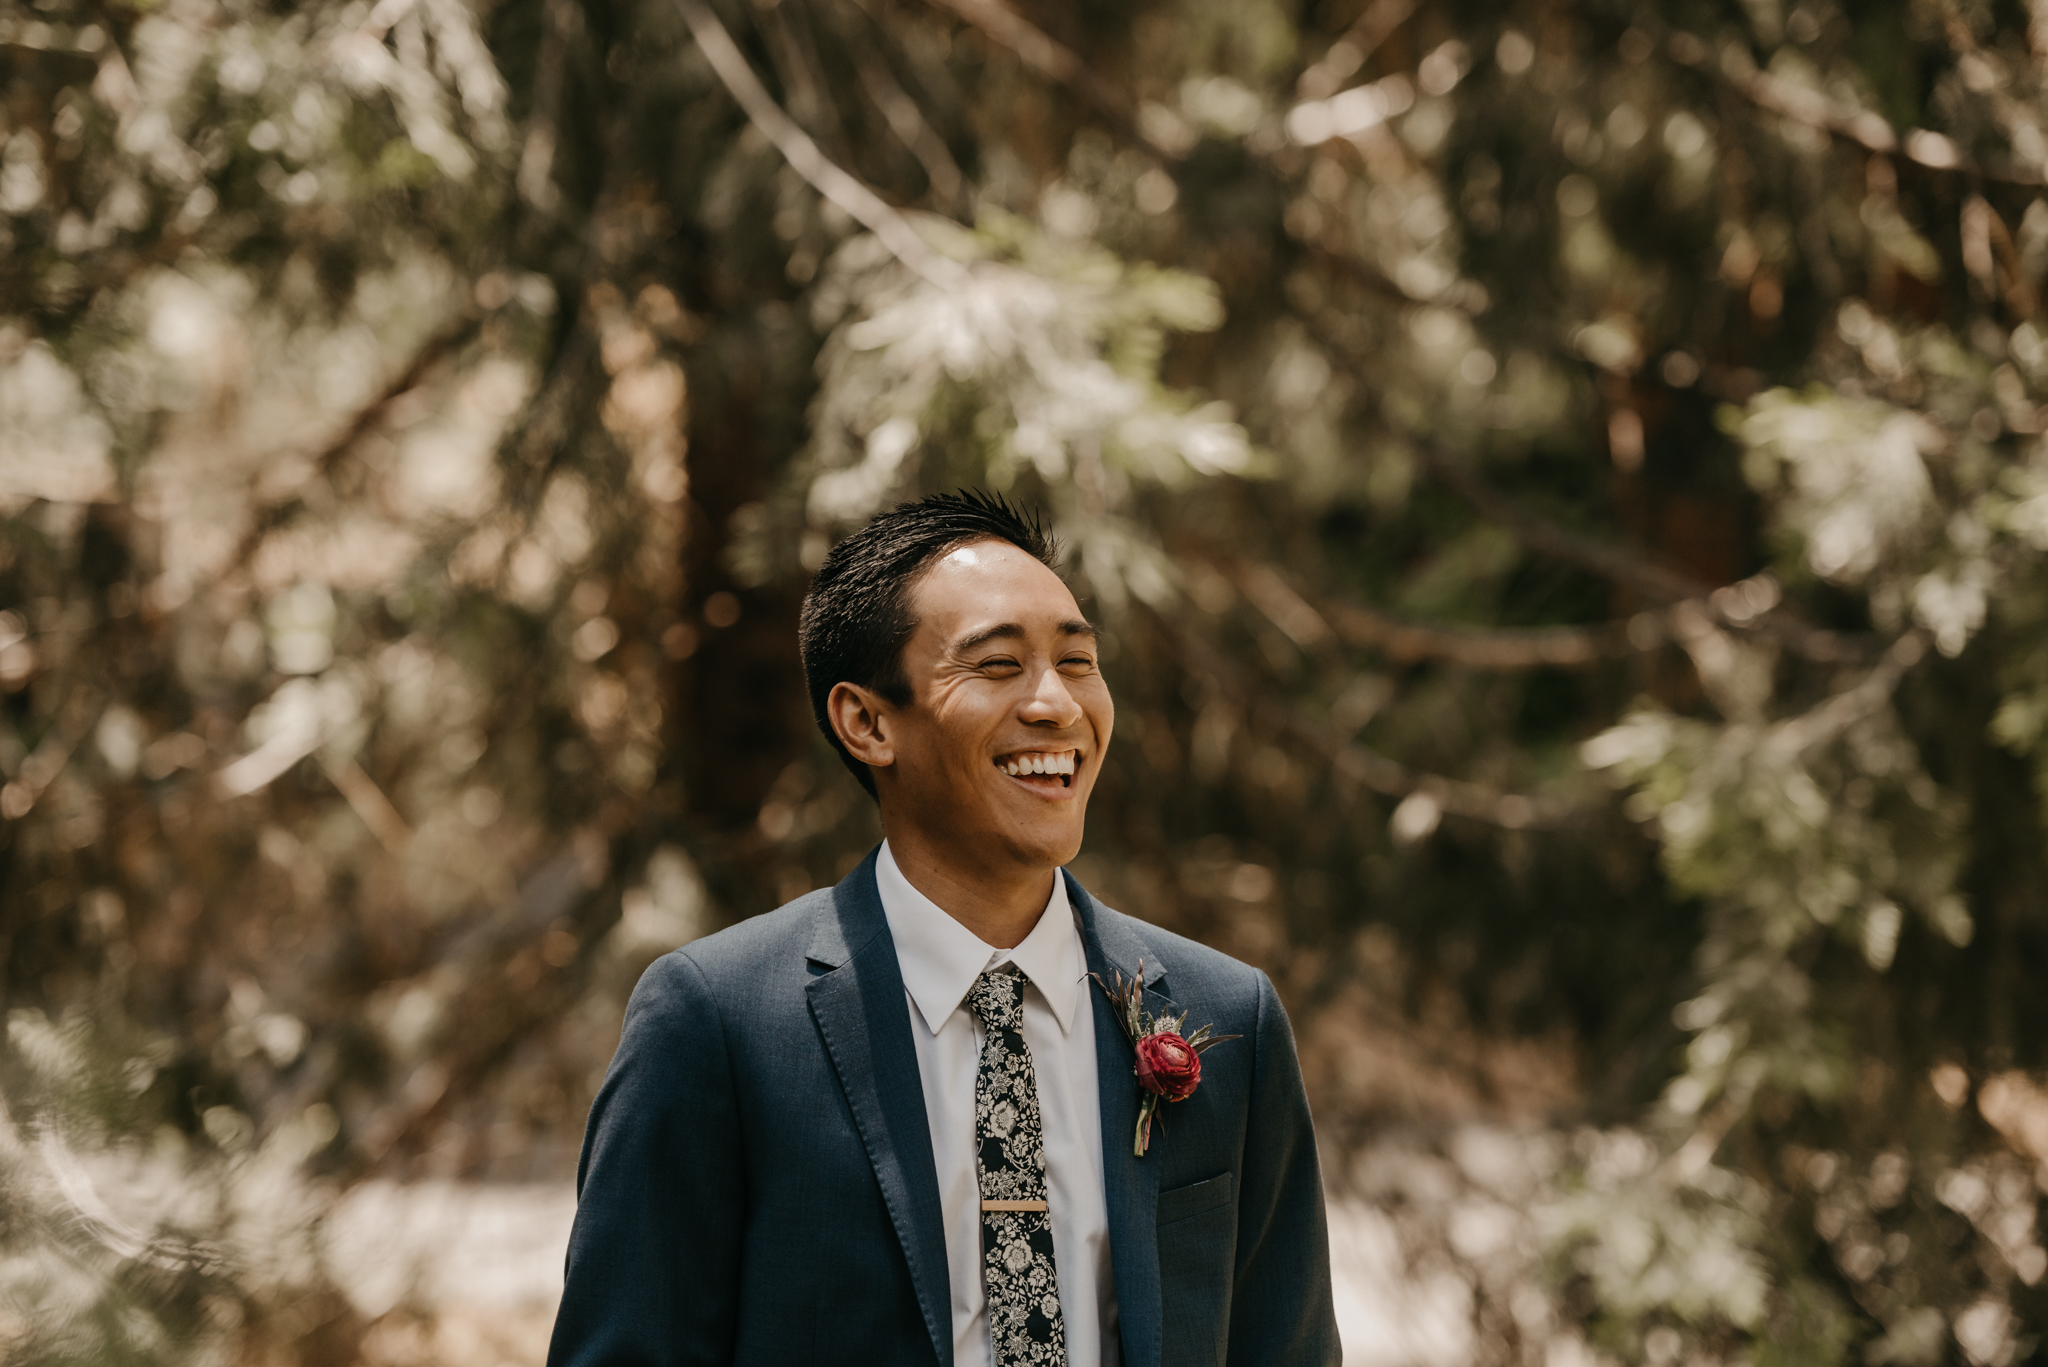 © Isaiah + Taylor Photography - Evergreen Lodge Destination Yoesmite Wedding - Los Angeles Wedding Photographer-043.jpg